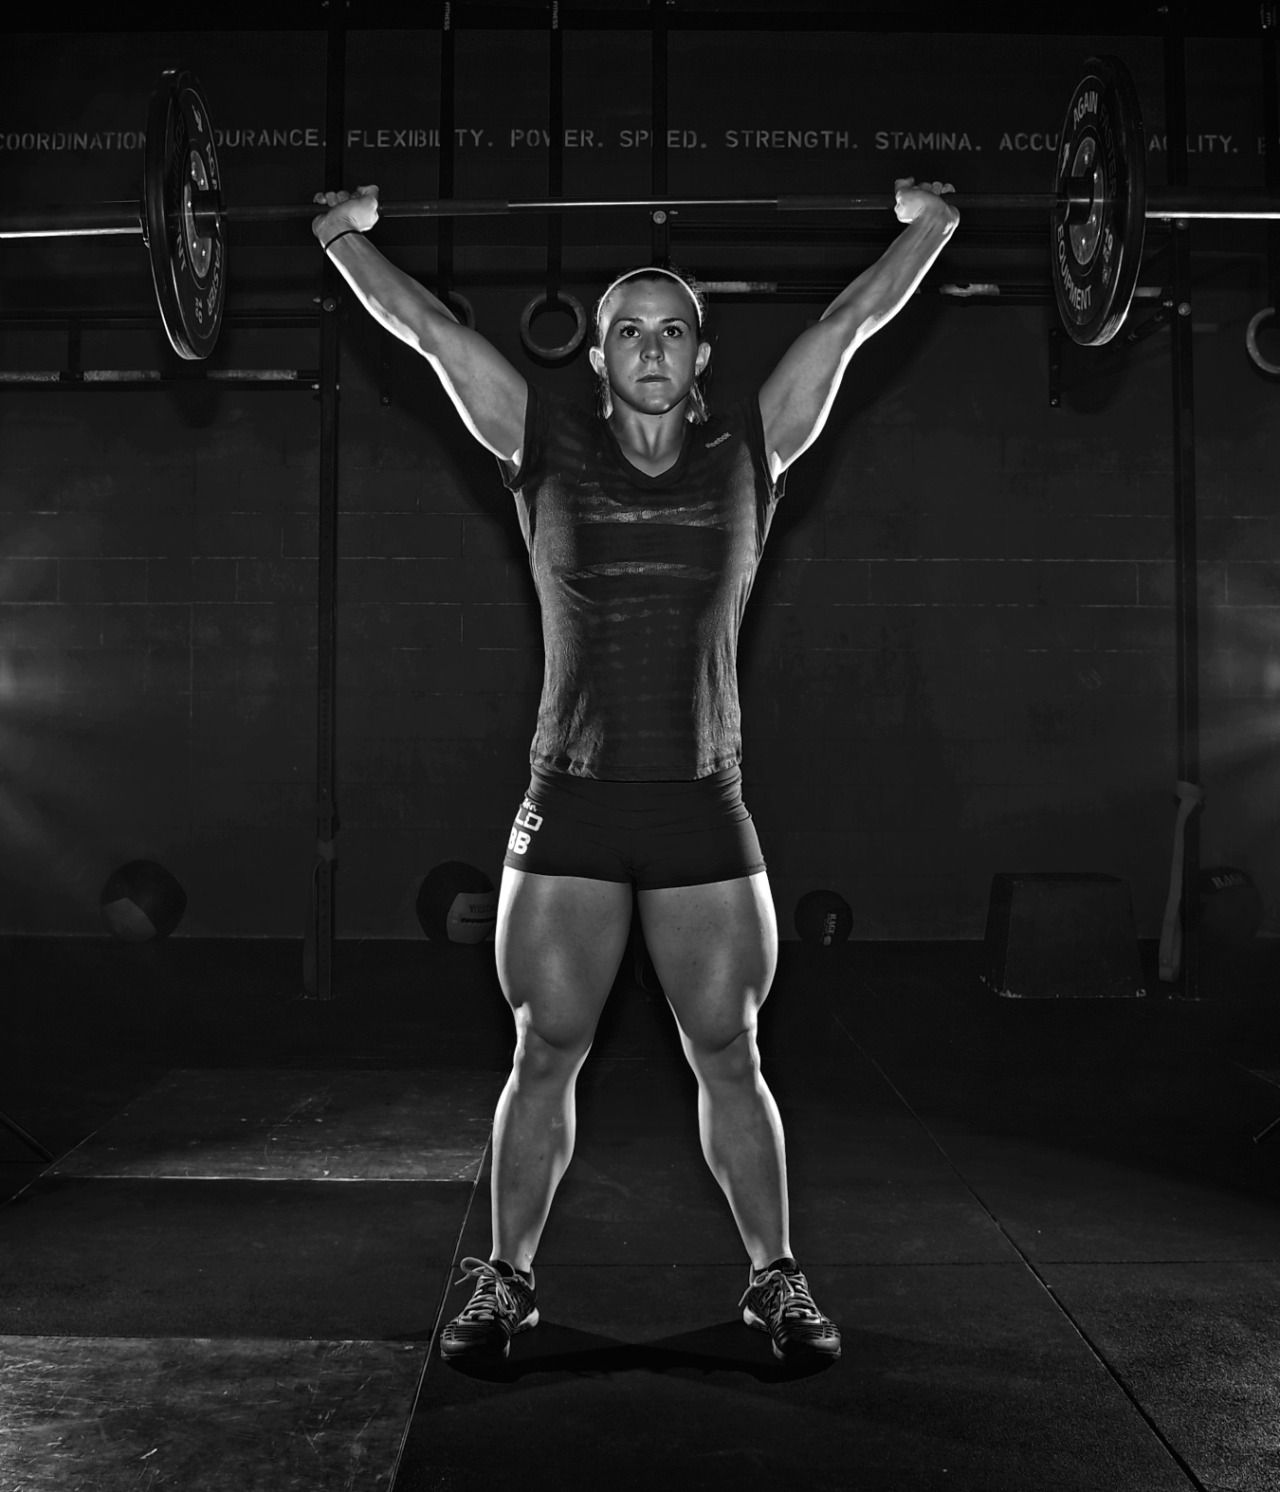 Lady Feral Photo Gym Images Garage Gym Crossfit Women